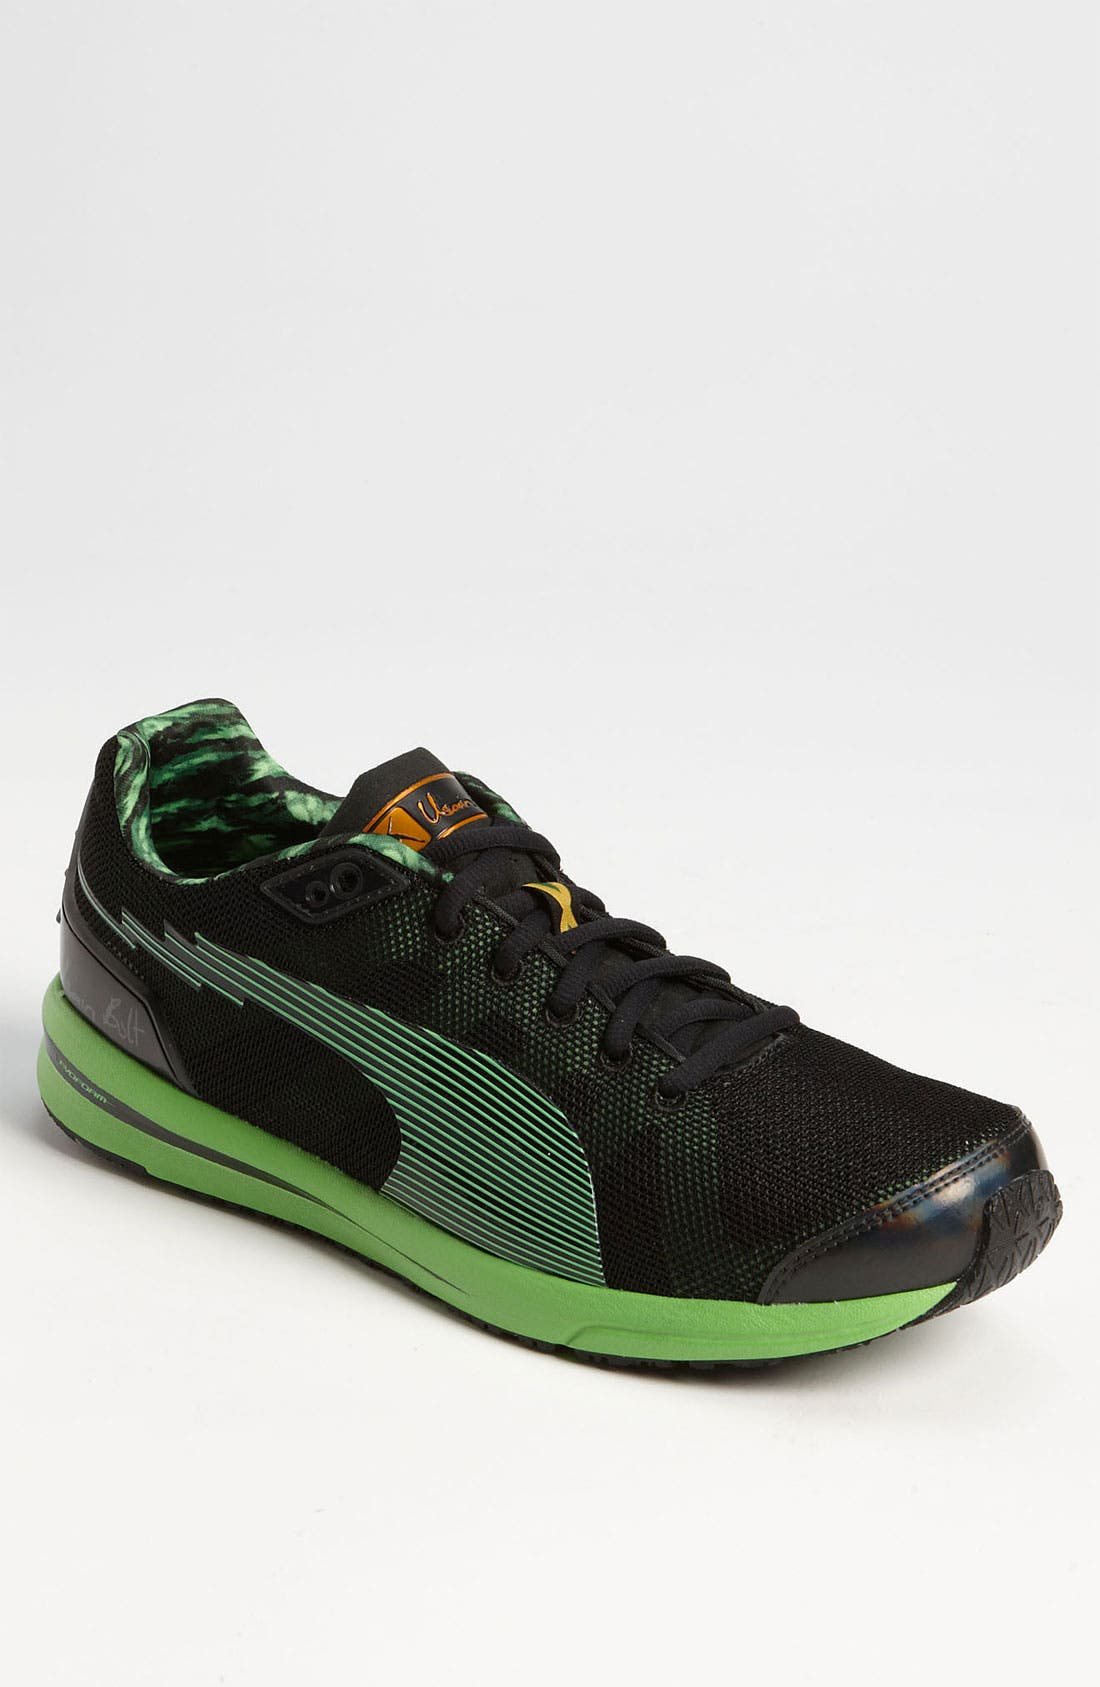 Main Image - PUMA 'Bolt evoSPEED' Running Shoe (Men)